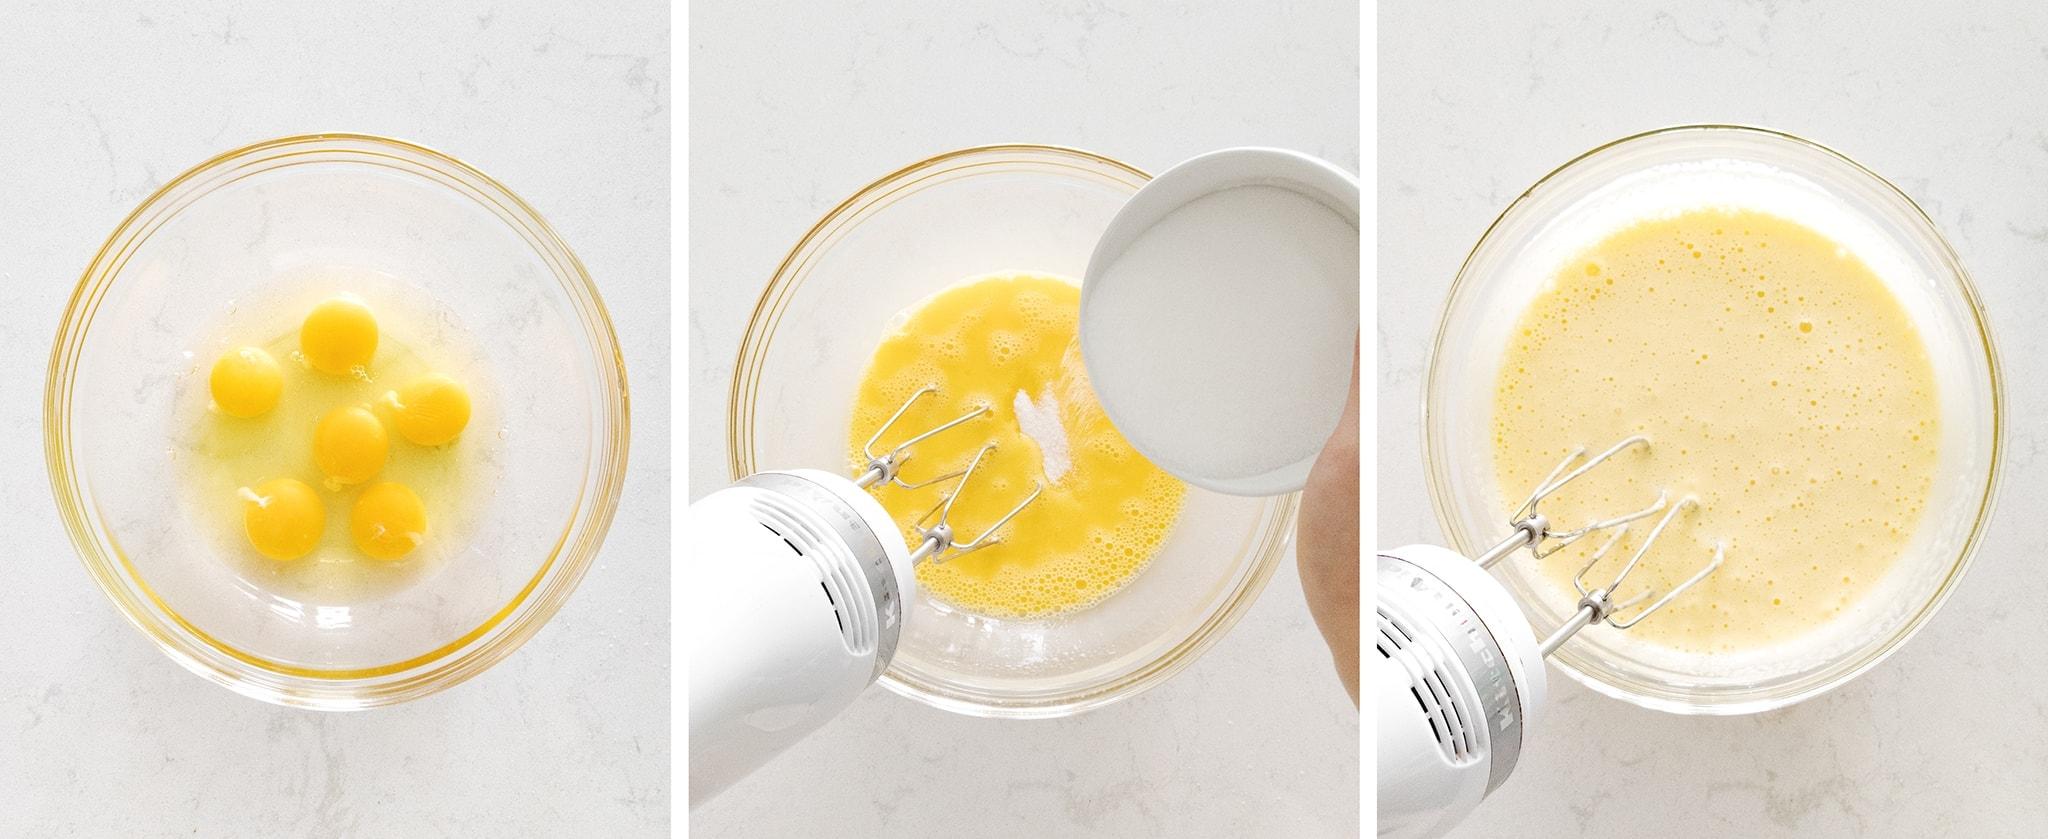 Mixing eggs for cake batter